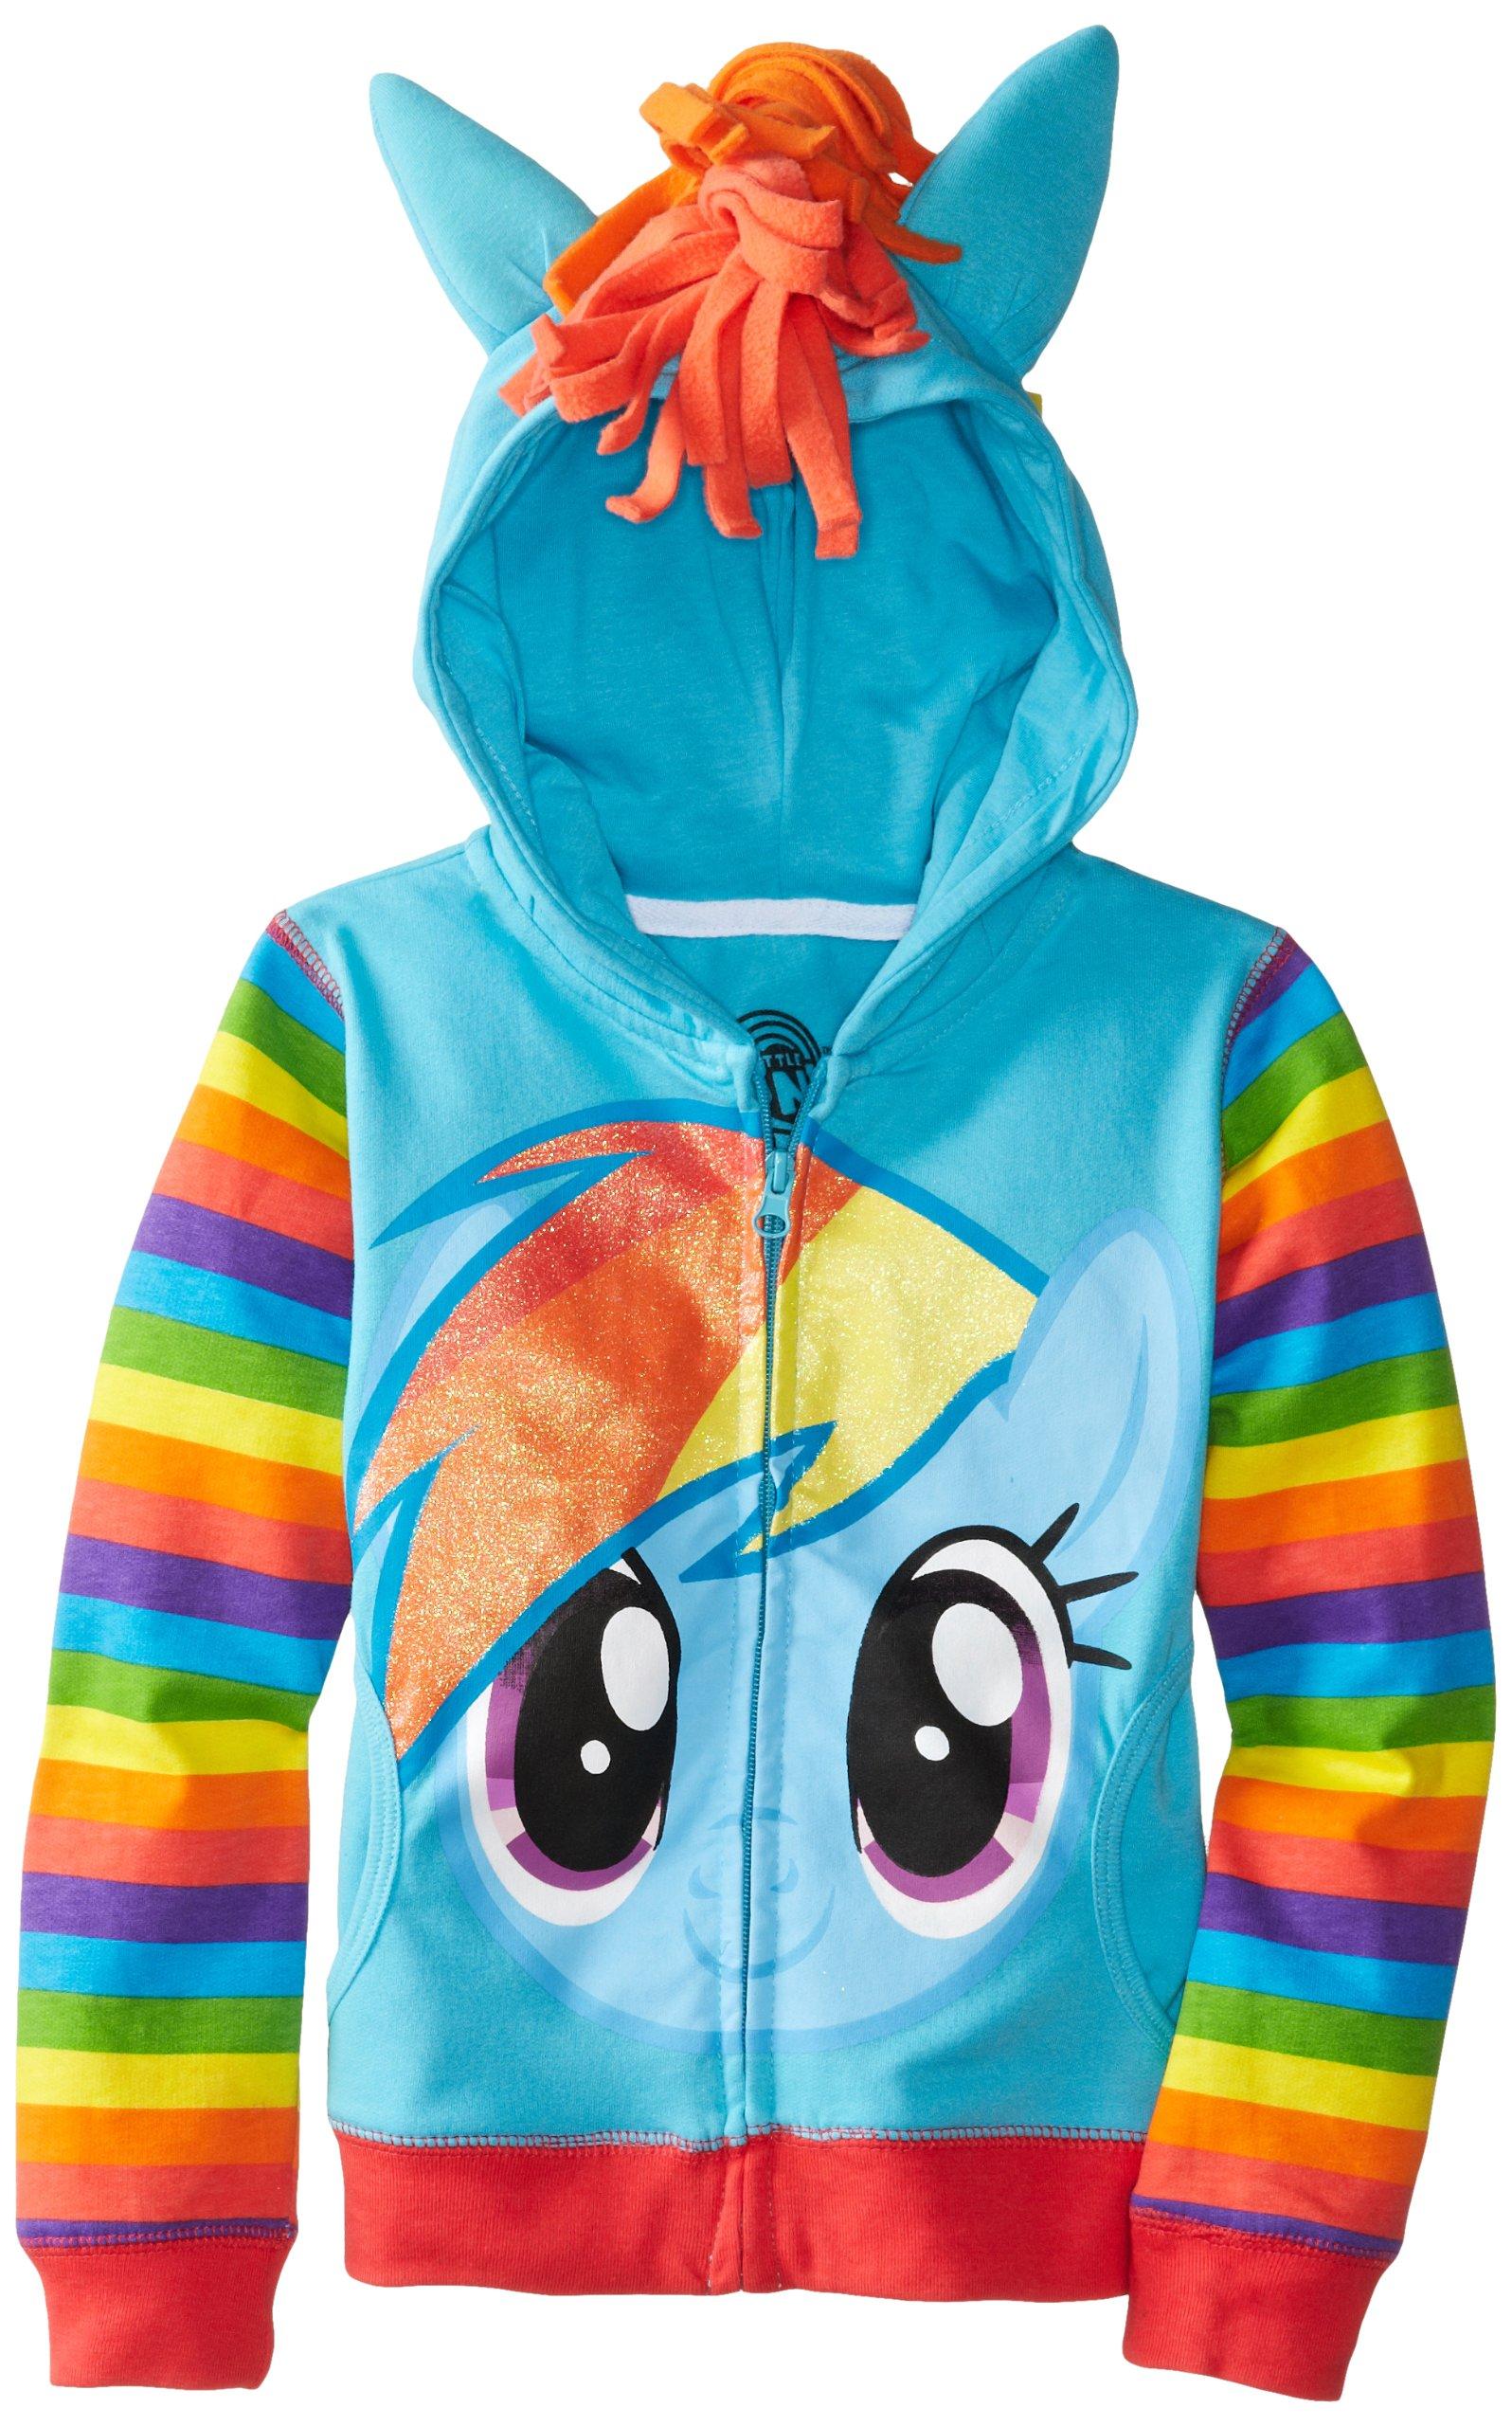 Freeze Little Girls' My Little Pony Rainbow Dash Hoodie, Blue/Multi, 5/6 by Freeze